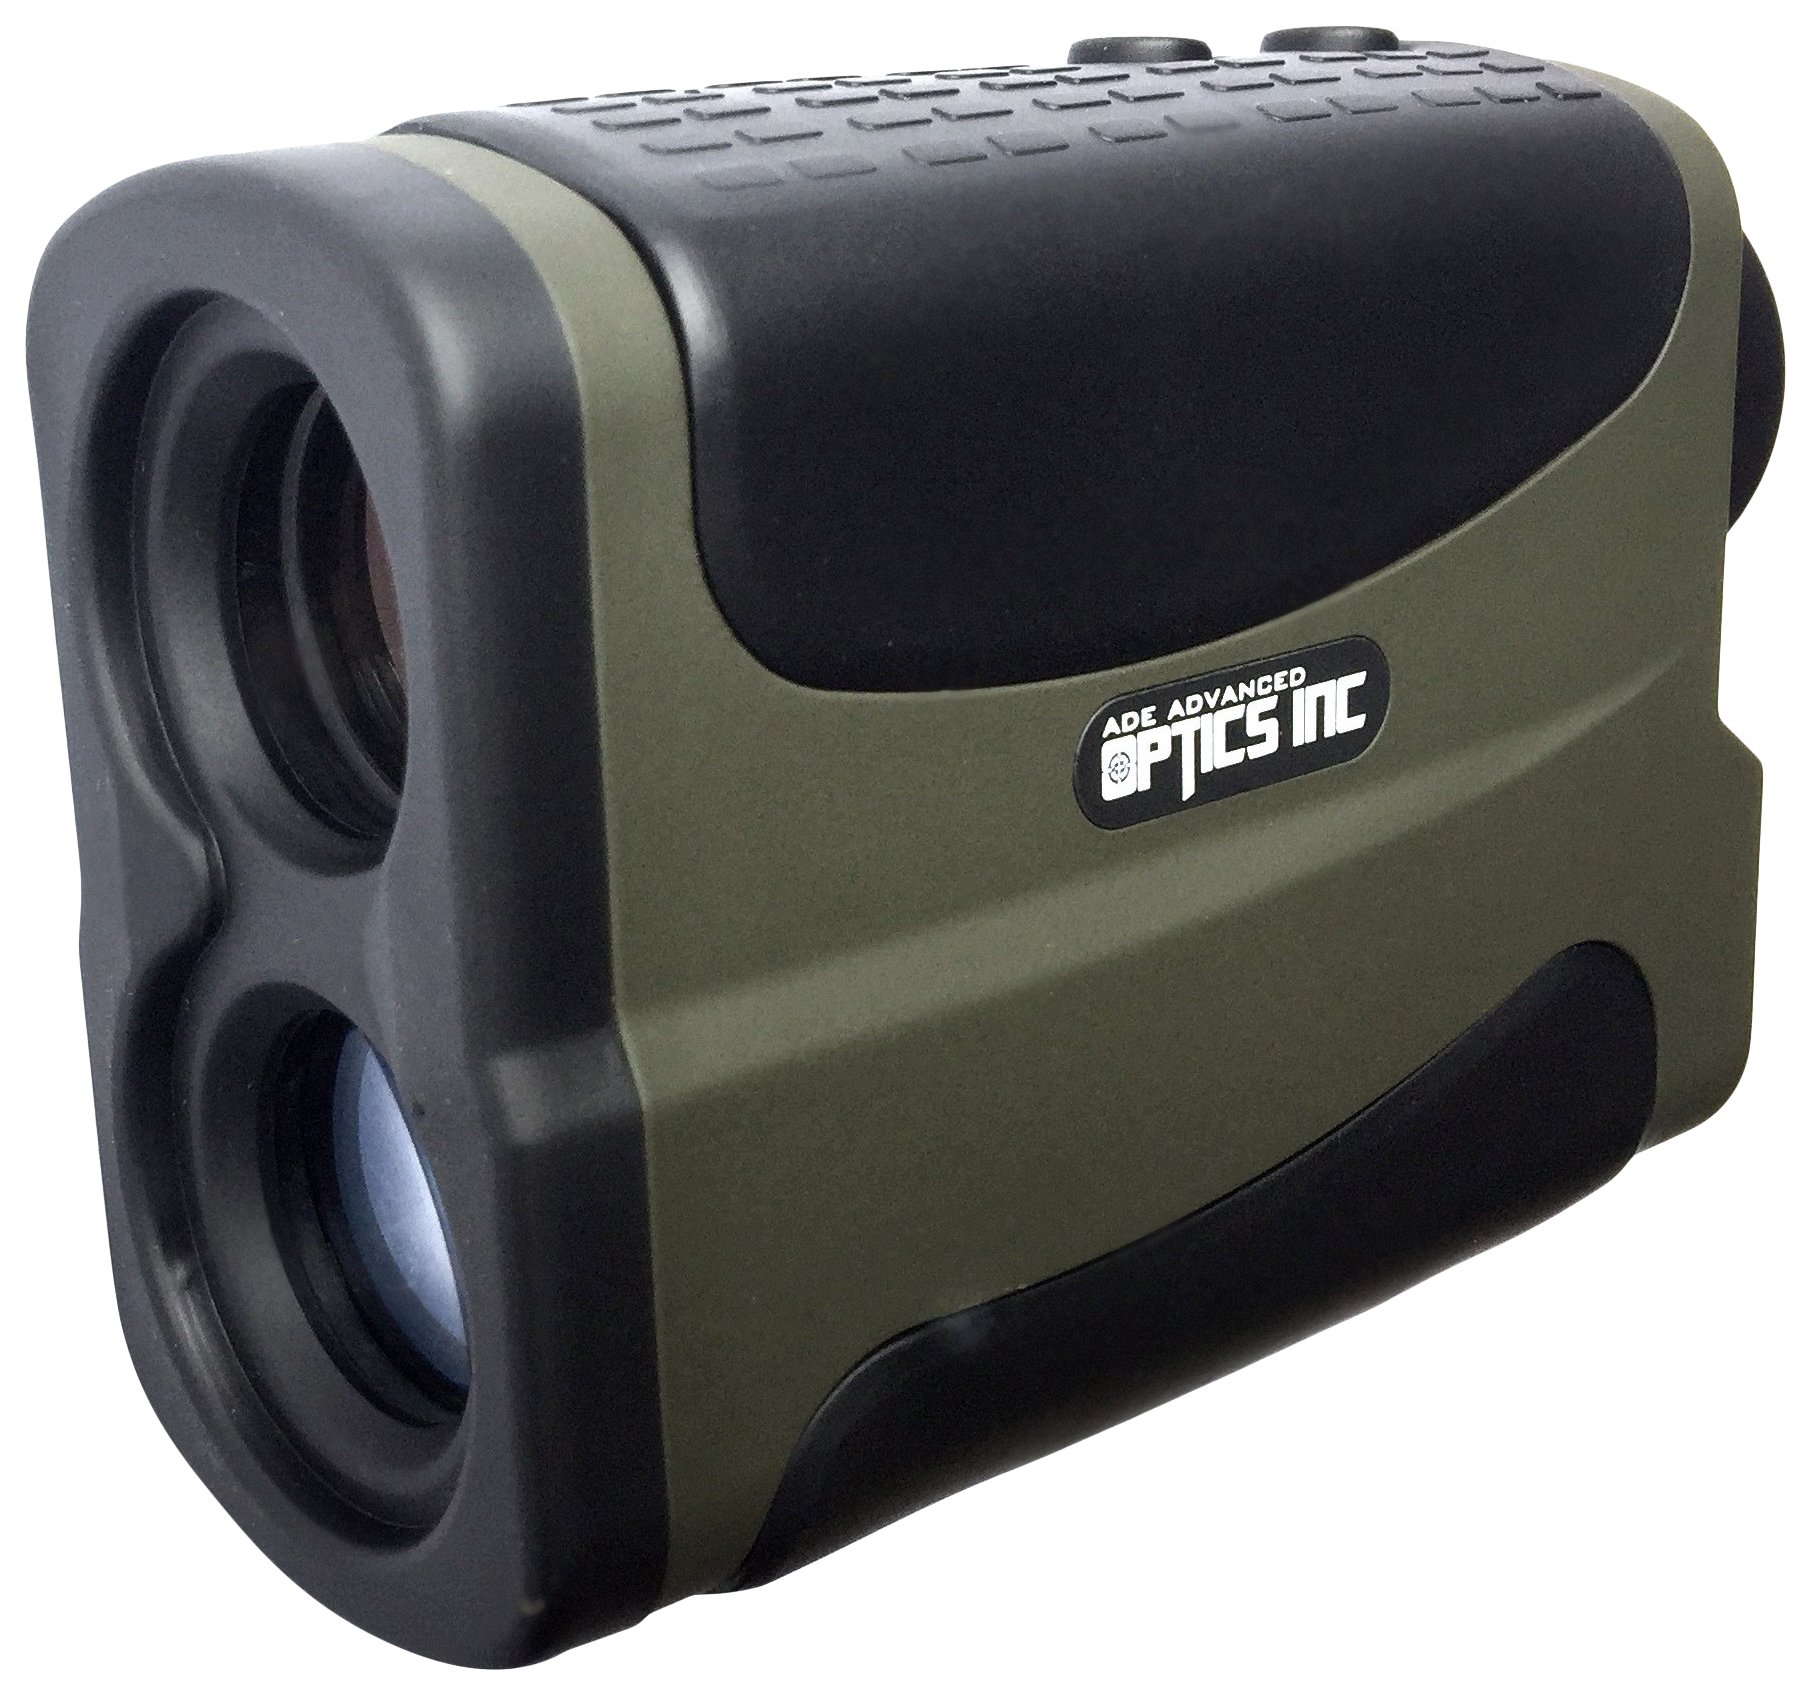 Ade Advanced Optics Golf Laser Hunting Range Finder with PinSeeker Binoculars, Green